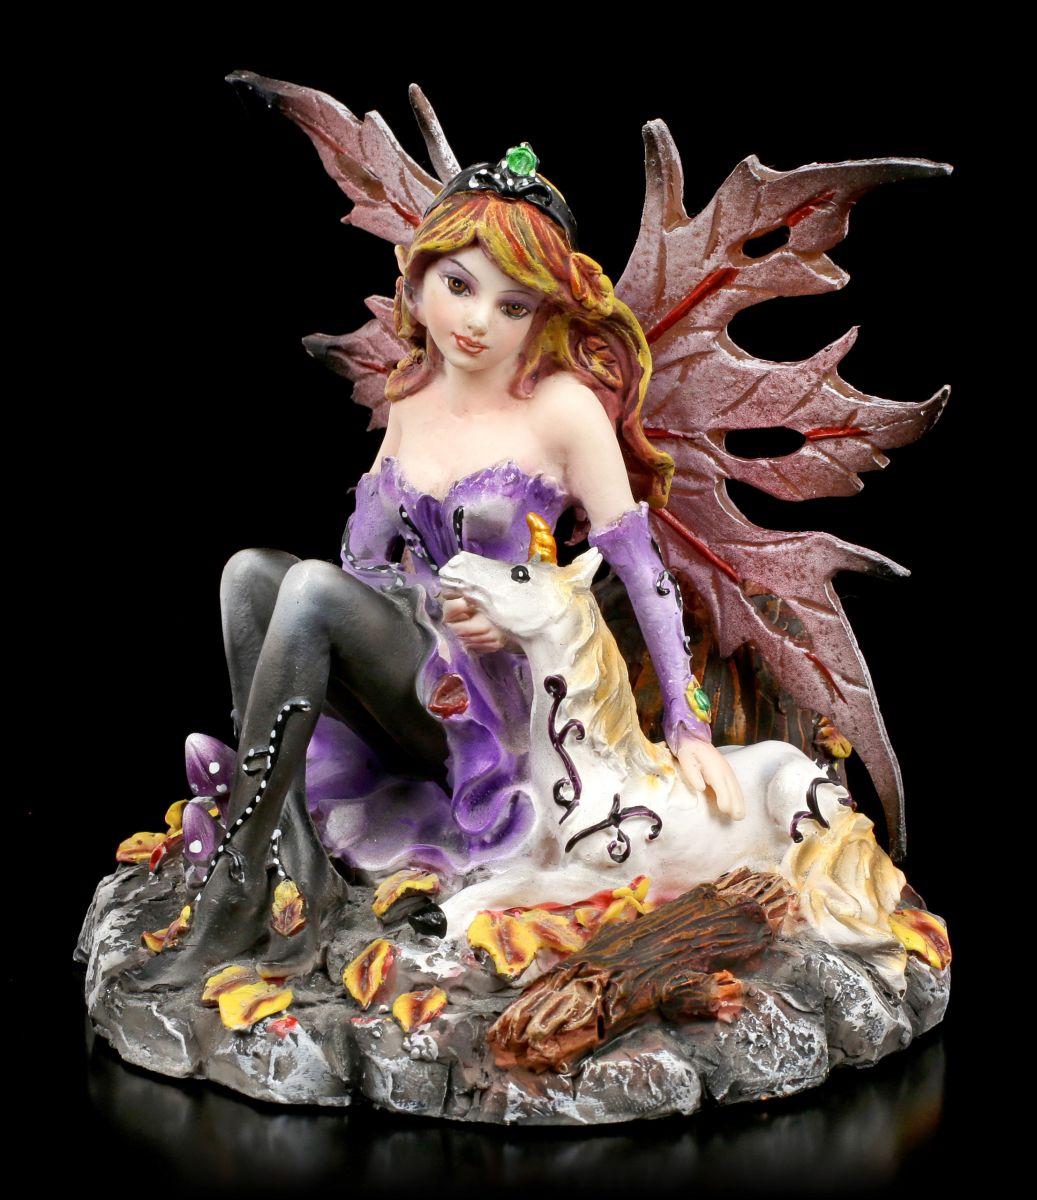 Blumenmädchen Üppig 2 x Figur Elfen Feen Dekofigur Rosa Hängend Elfenfigur Rose